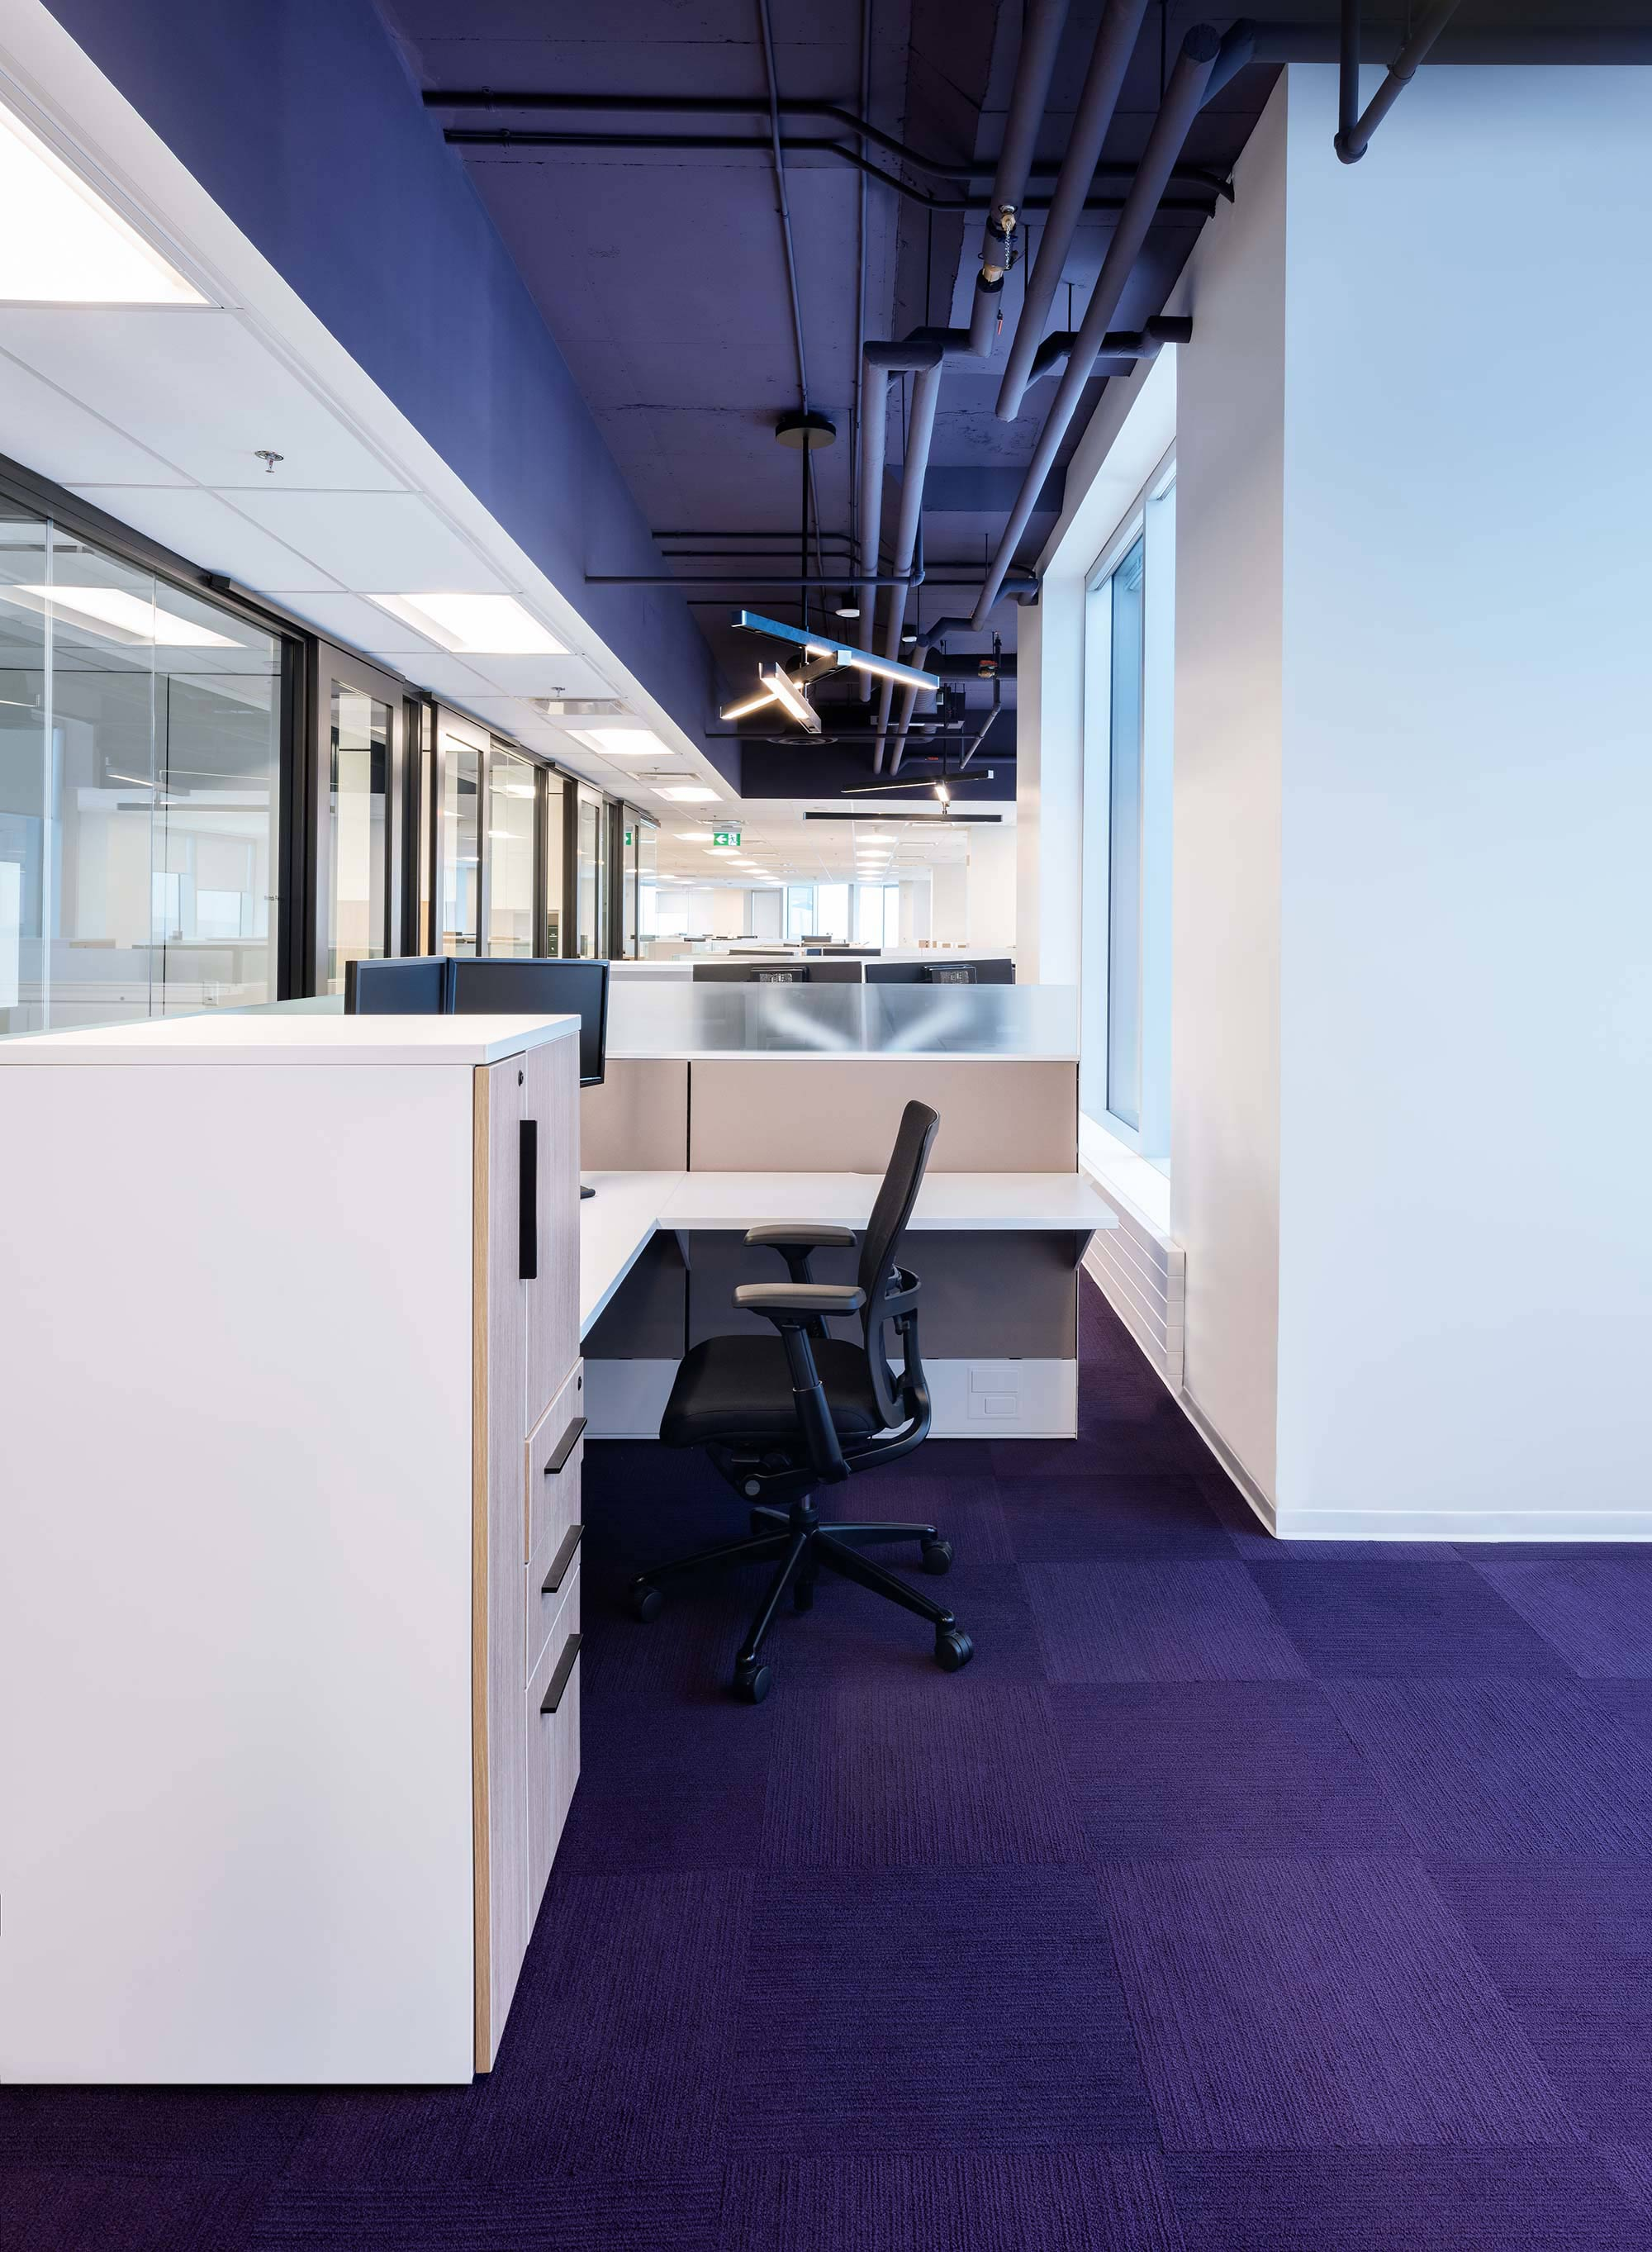 interior-design-law-office-area.jpg